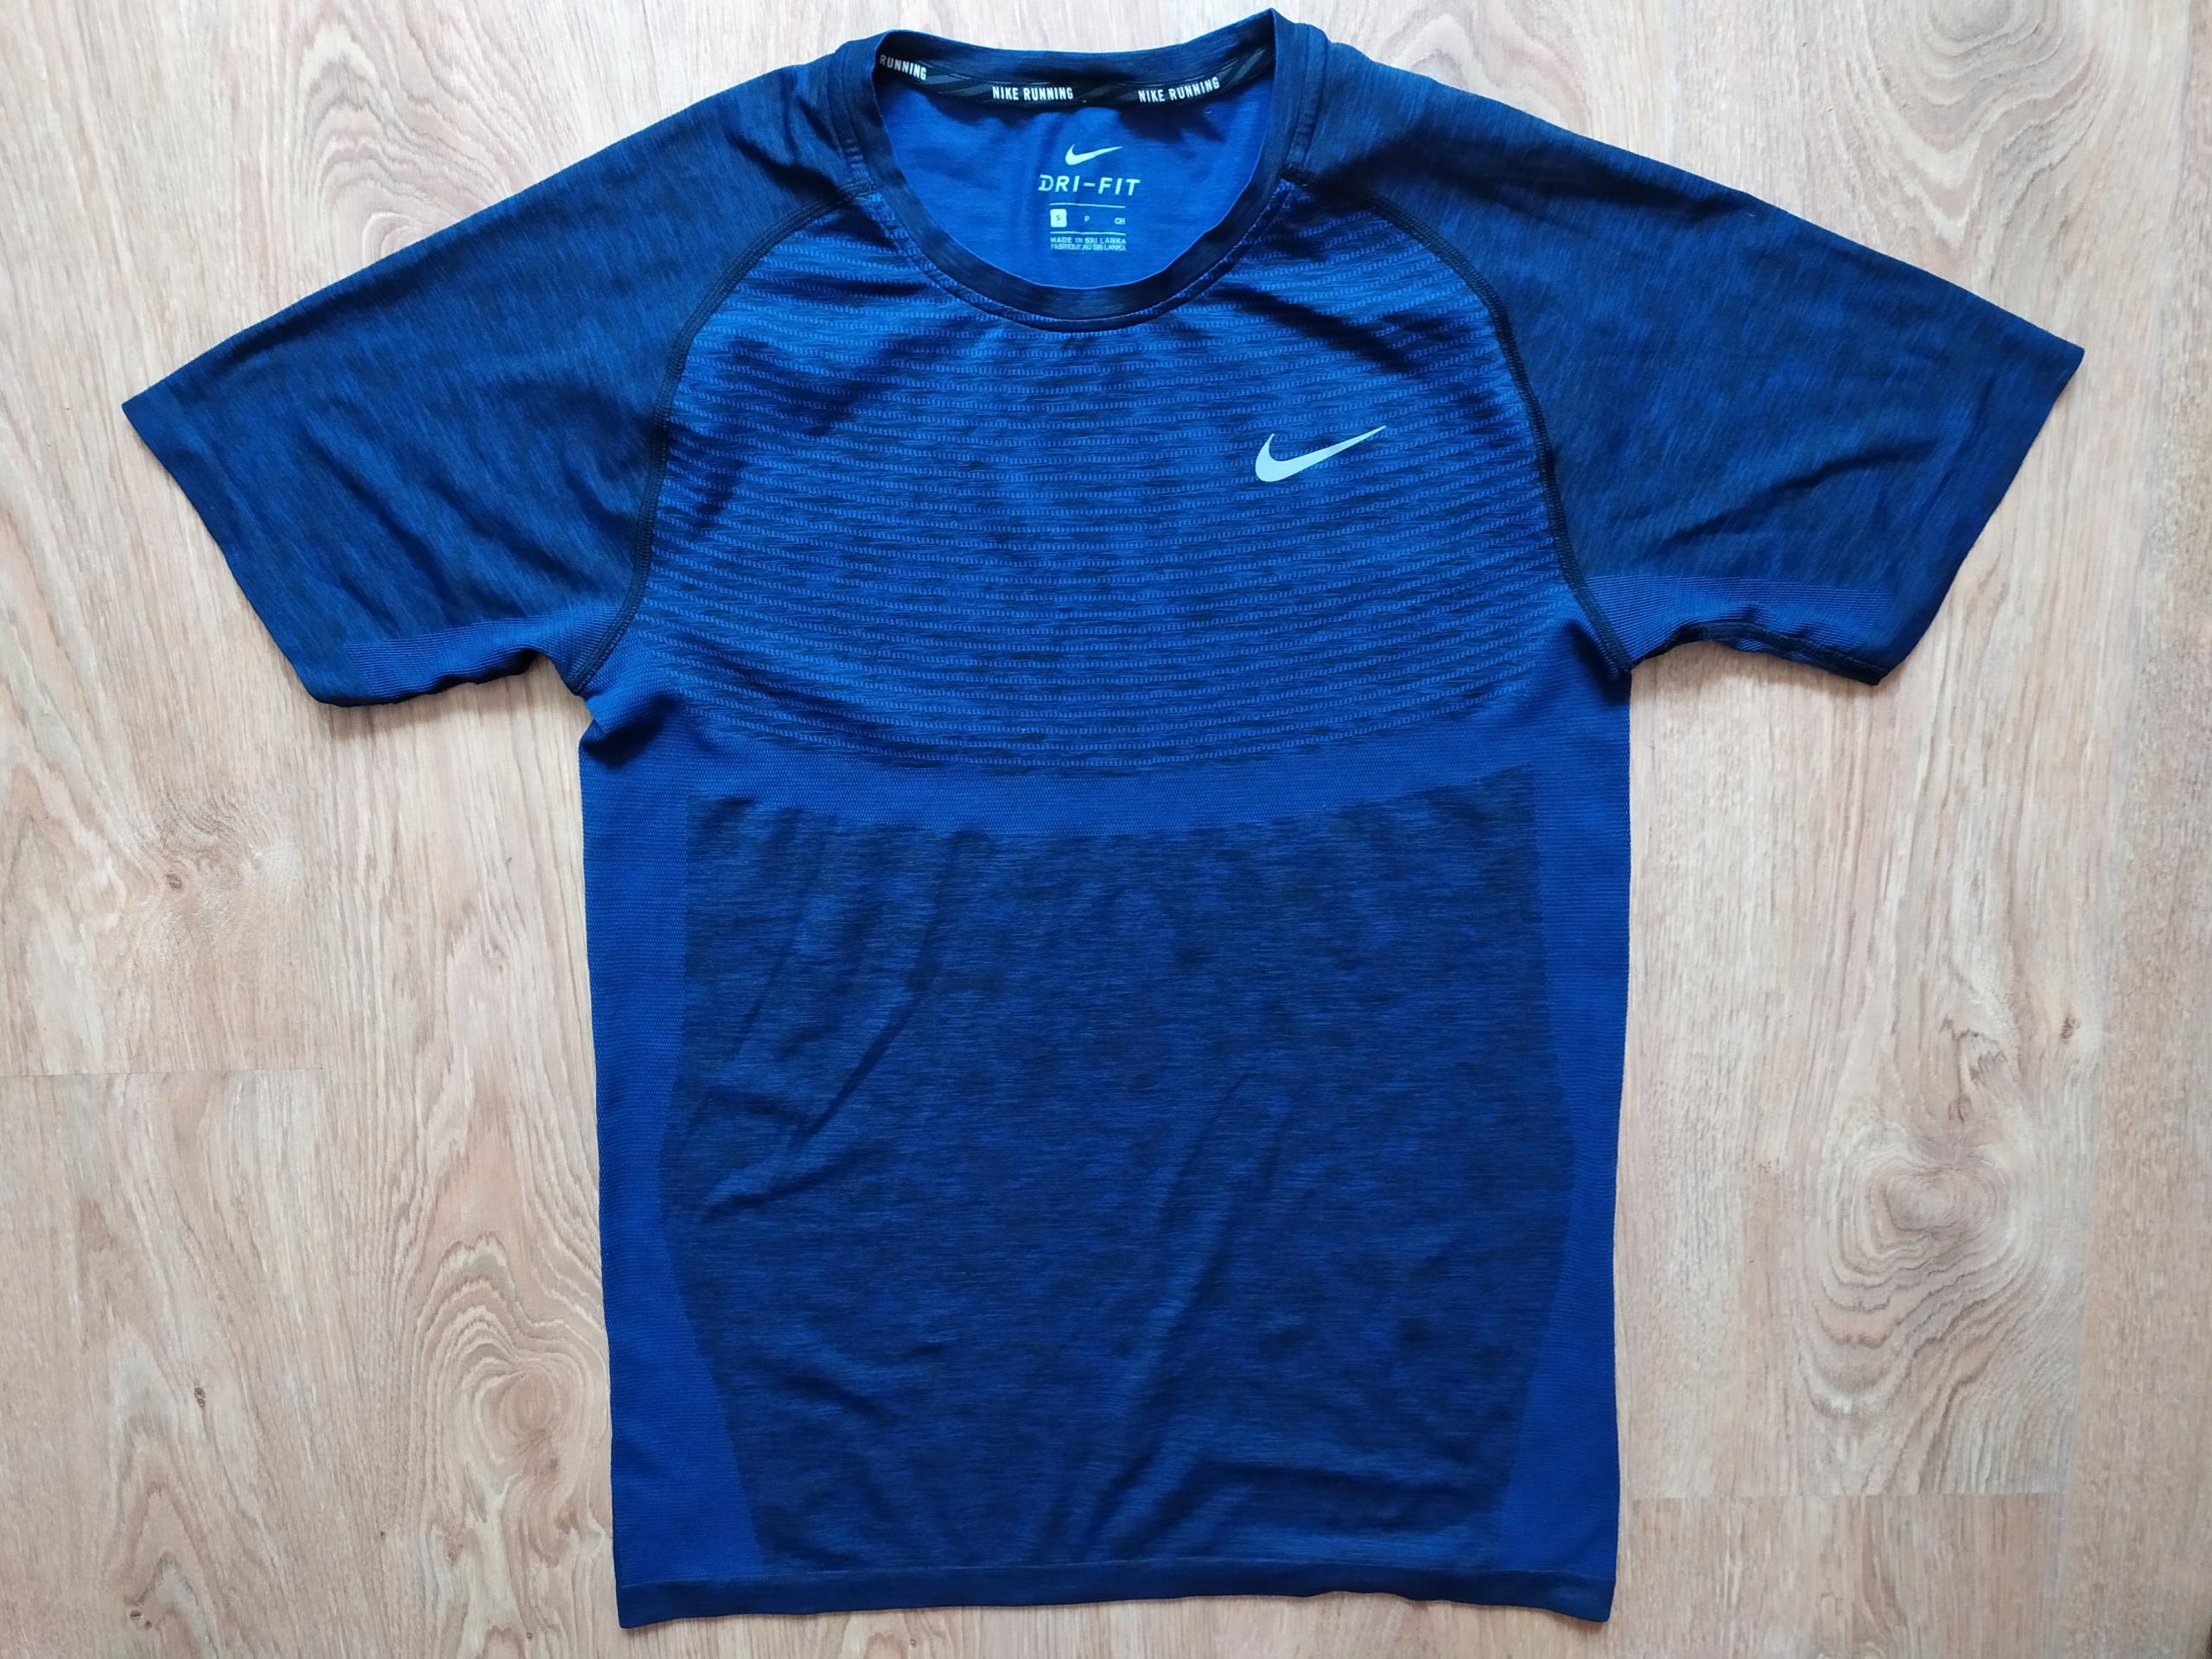 koszulka Nike Drifit S/M jNOWA